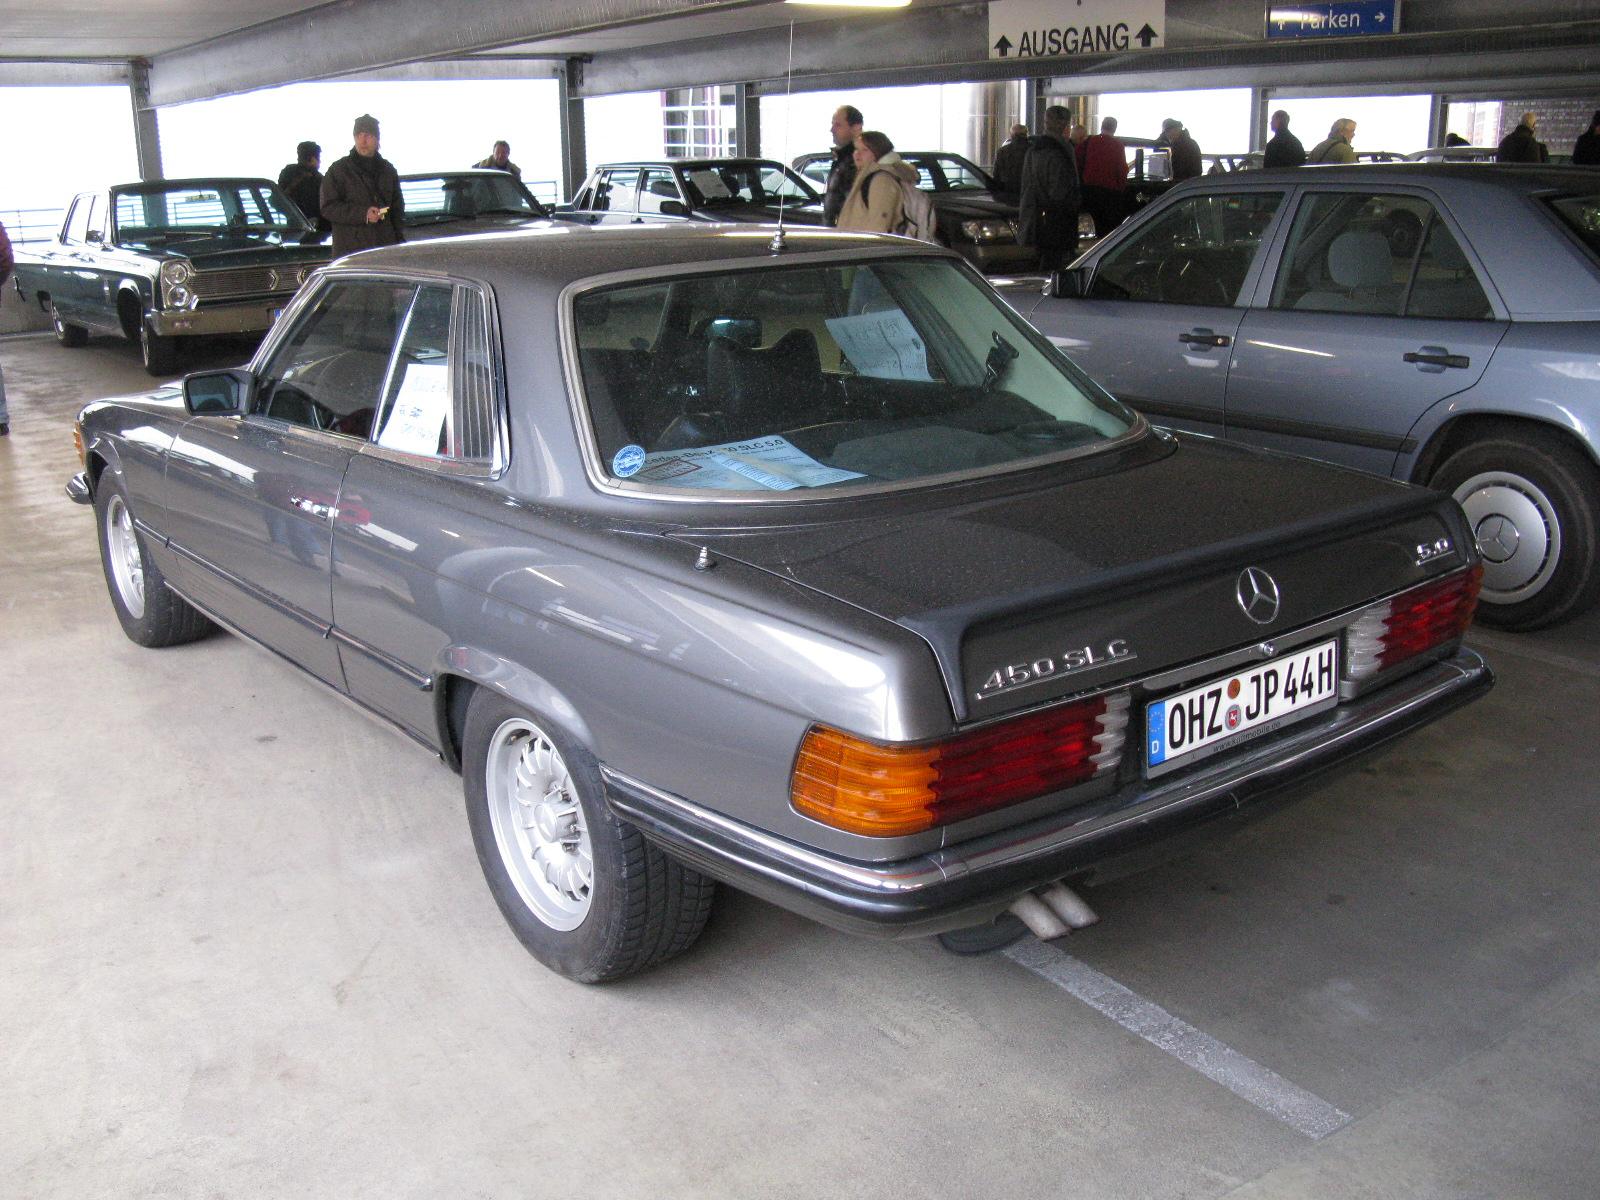 File:Mercedes-Benz 450 SLC 5.0 (6950739039).jpg - Wikimedia Commons